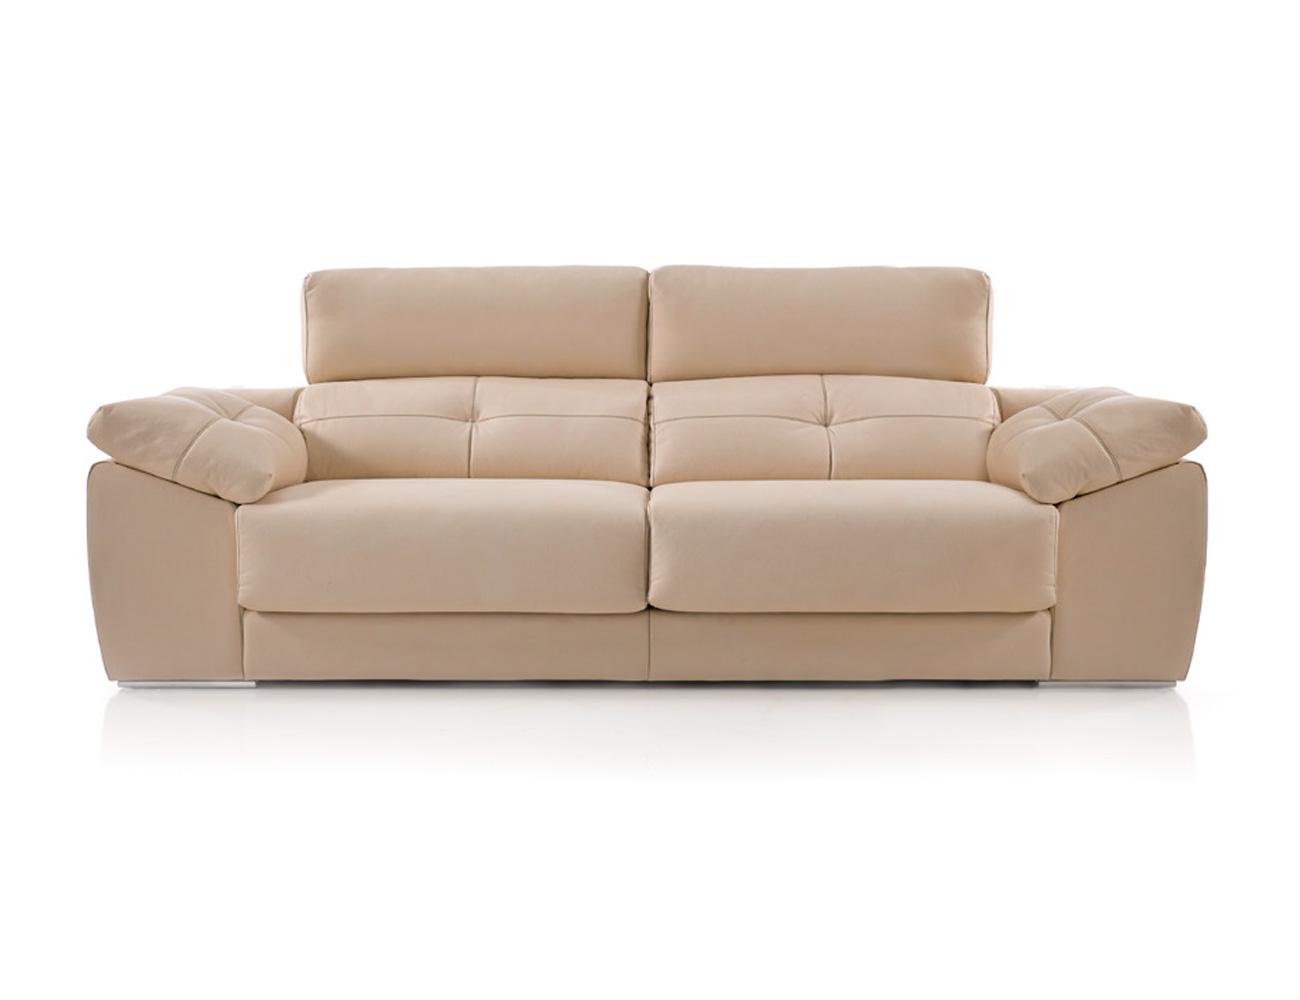 Sofa moderno 3 2 plazas anti manchas8